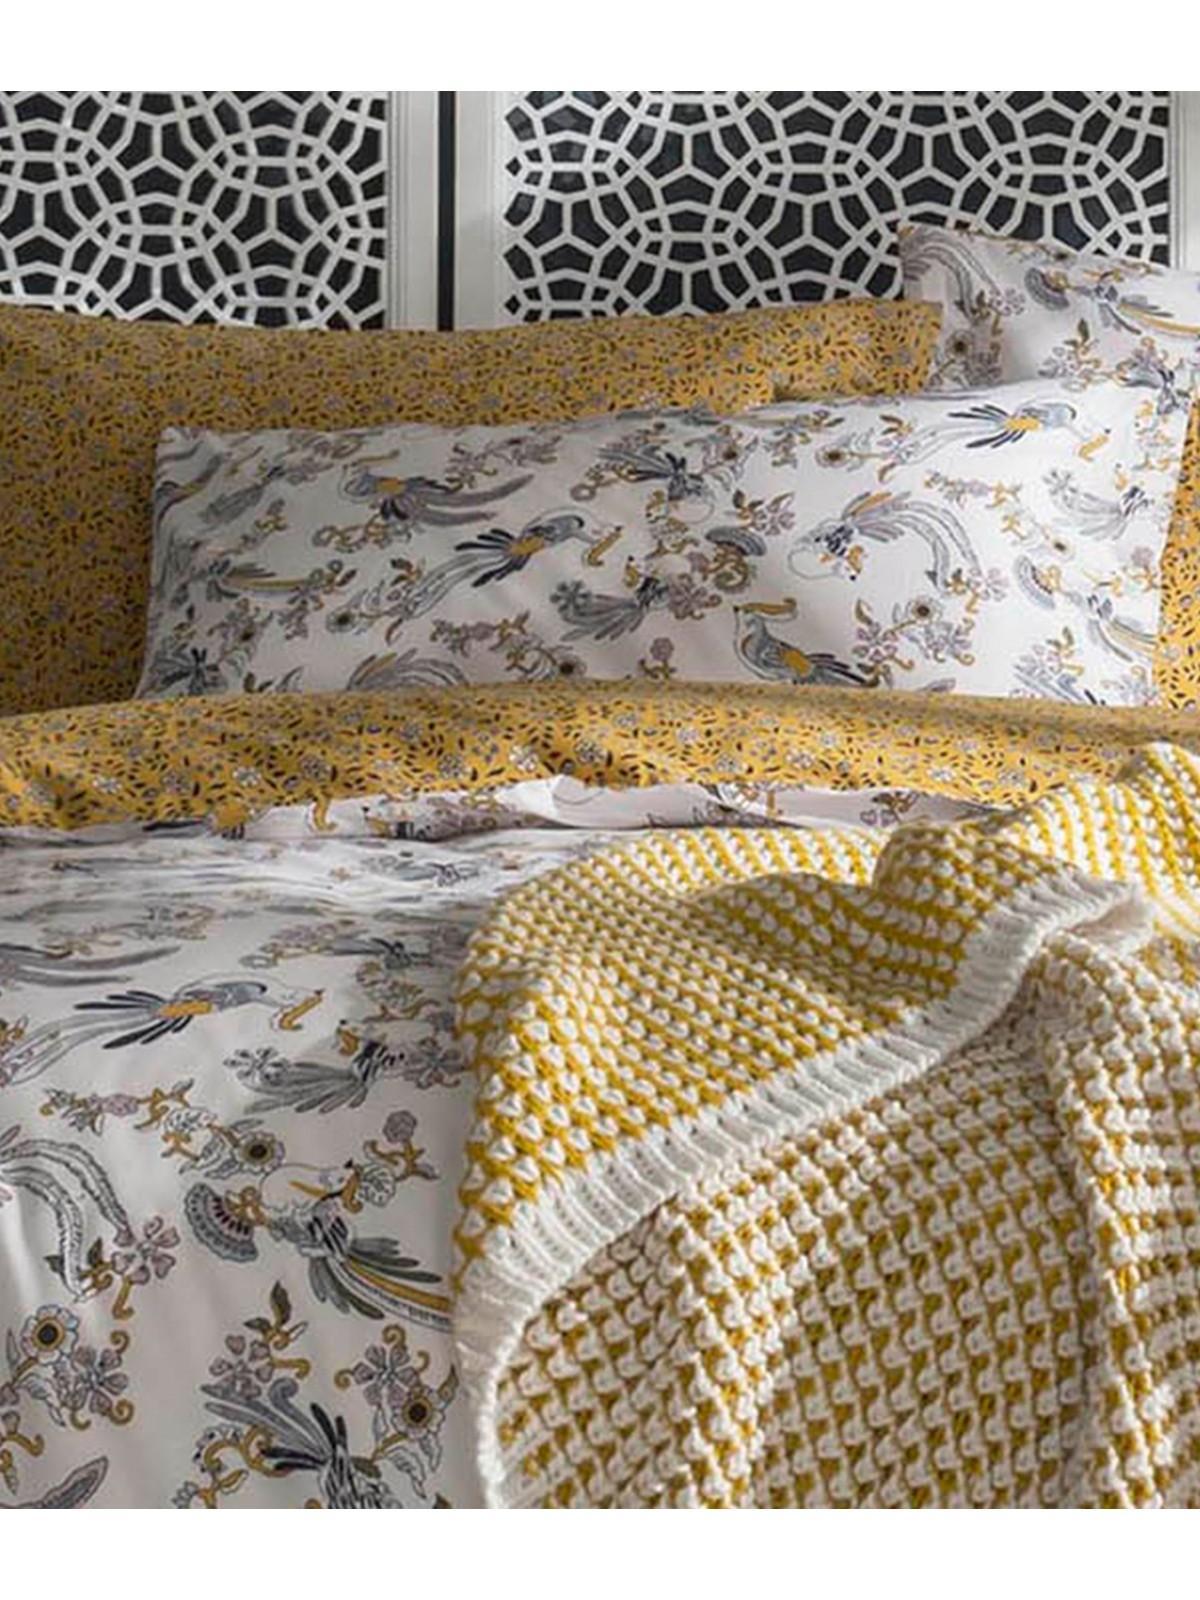 Super King Fat Face Oriental Bird Ochre Duvet Cover Set Home Furniture Diy Bed Linens Sets Bedding Sets Duvet Covers